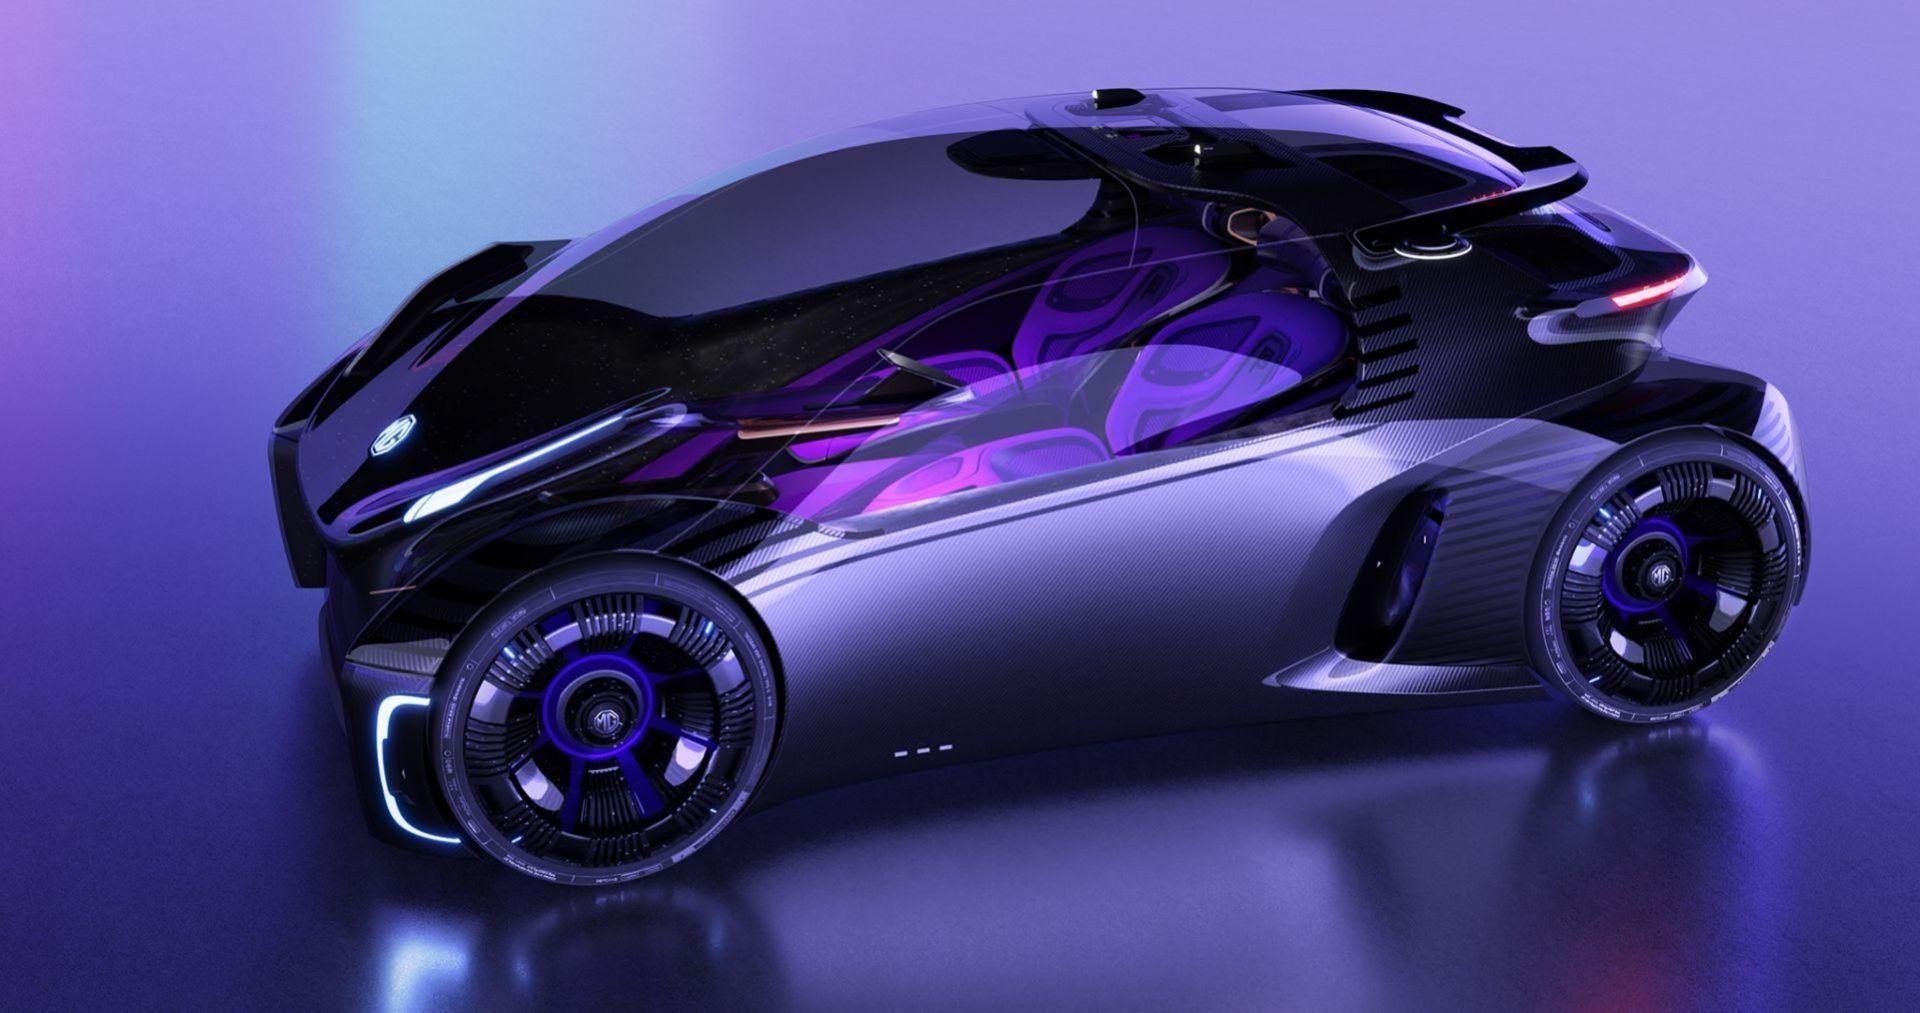 MG visar eldrivna konceptbilen Maze